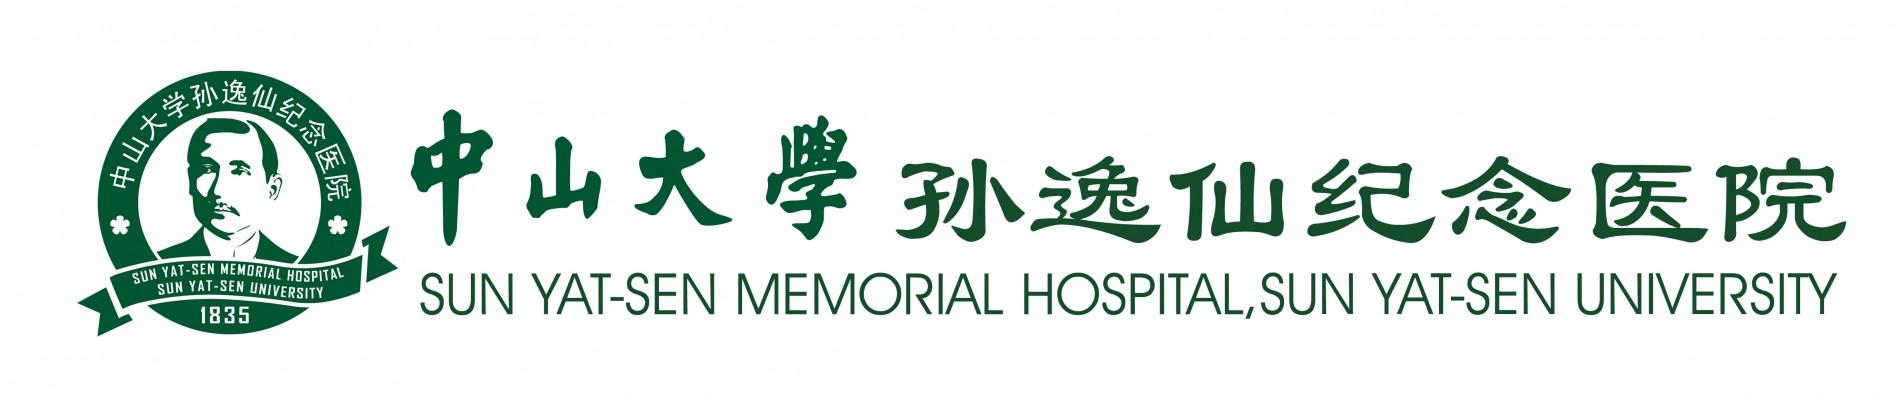 Sun Yat-Sen Memorial Hospital